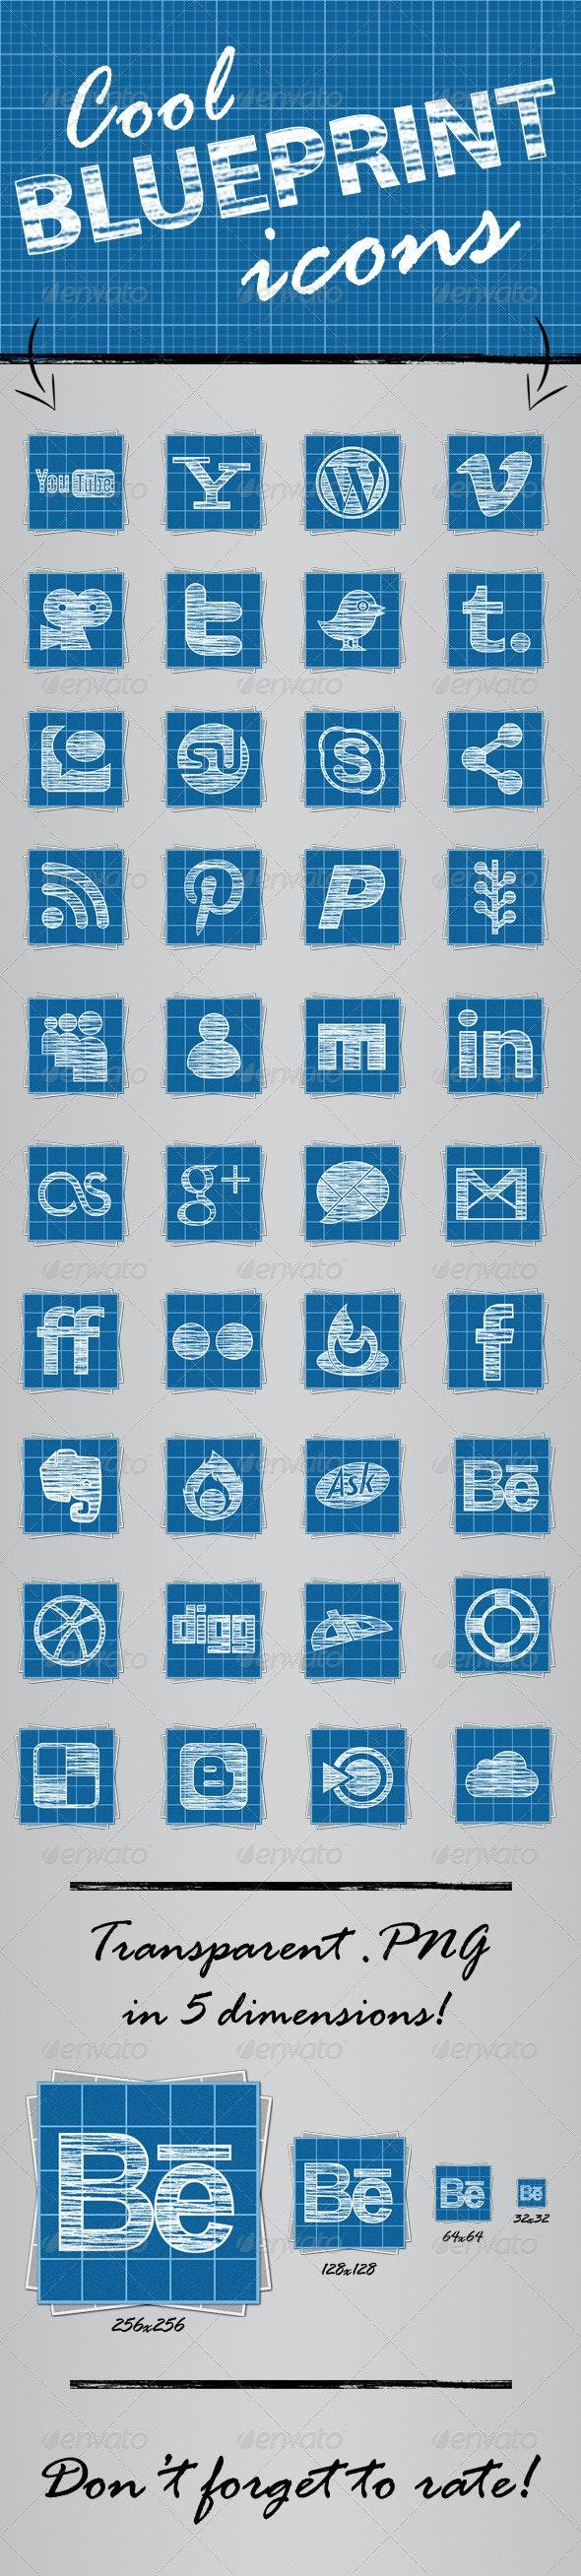 40 Cool Blueprint Social Media Icons - Web Icons